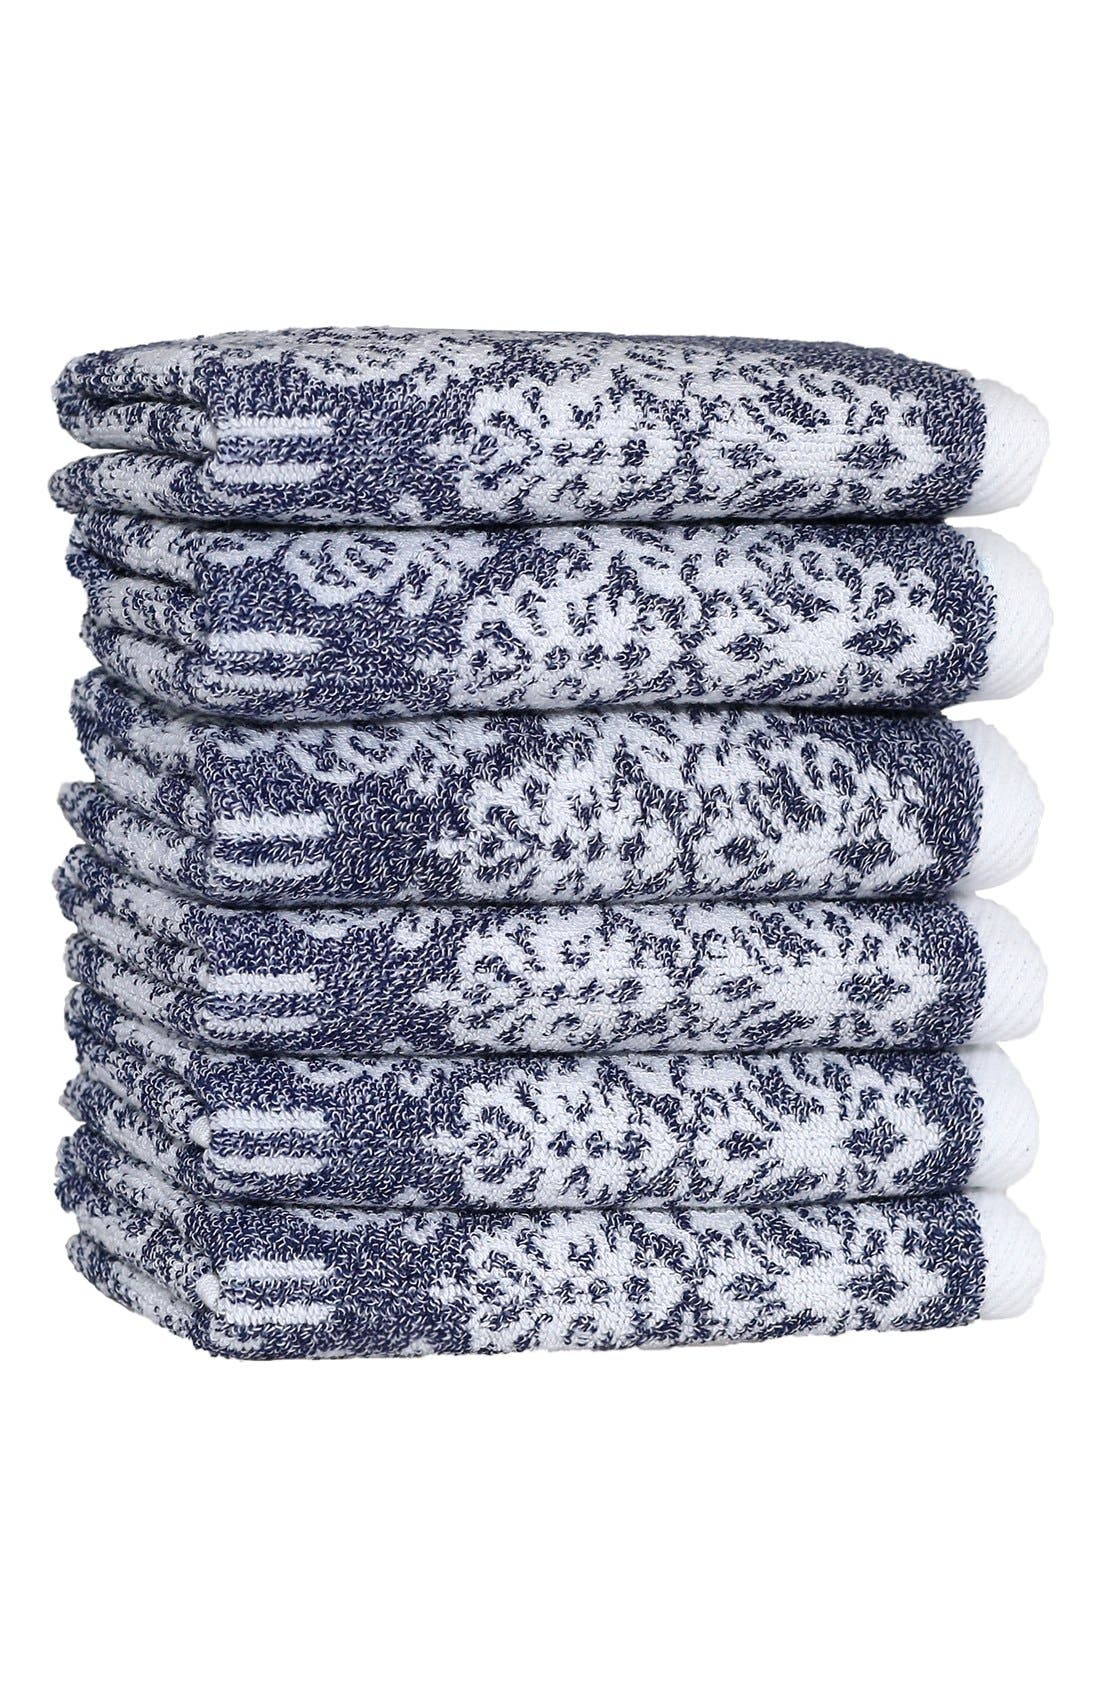 Main Image - Linum 'Gioia' Turkish Cotton Washcloths (Set of 6)